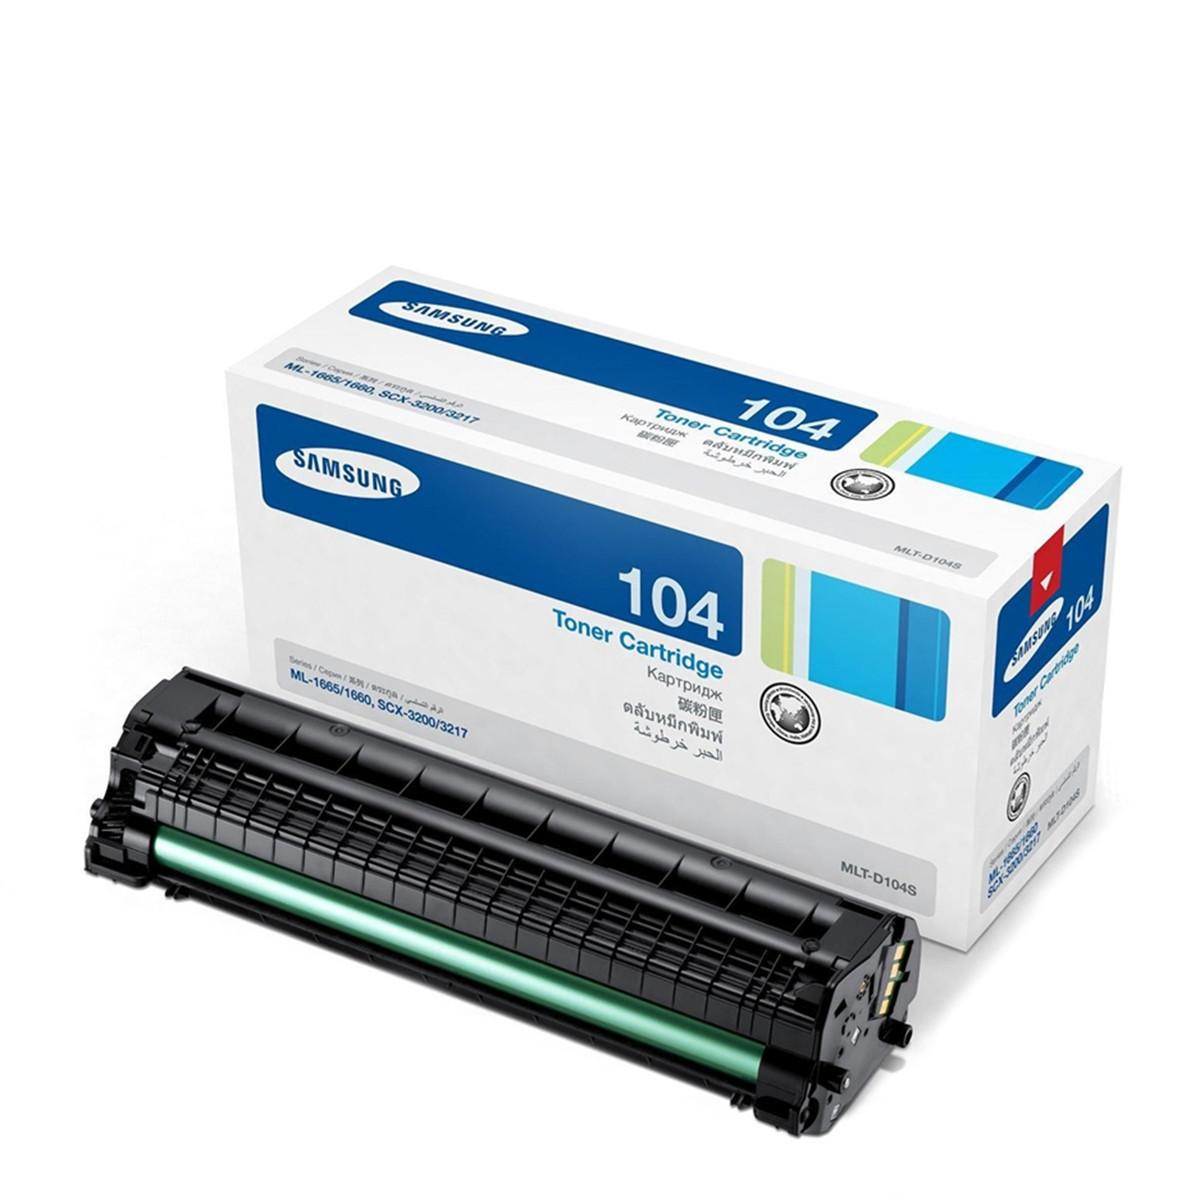 Toner Samsung MLT-D104S D104 104S | ML-1665 ML-1660 ML-1860 SCX-3200 | Original 1.5k